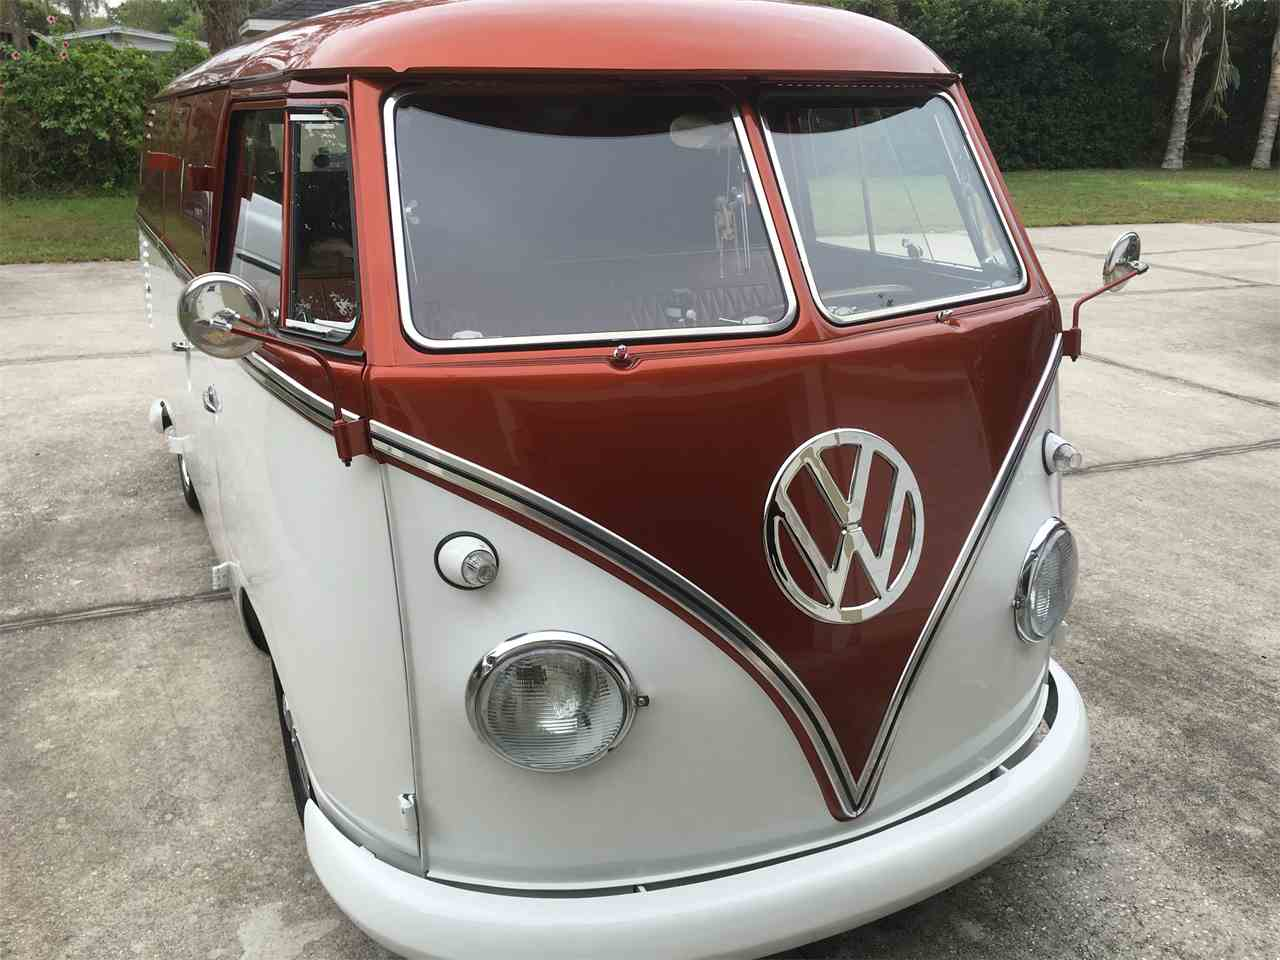 1960 Volkswagen Bus For Sale Classiccars Com Cc 948620